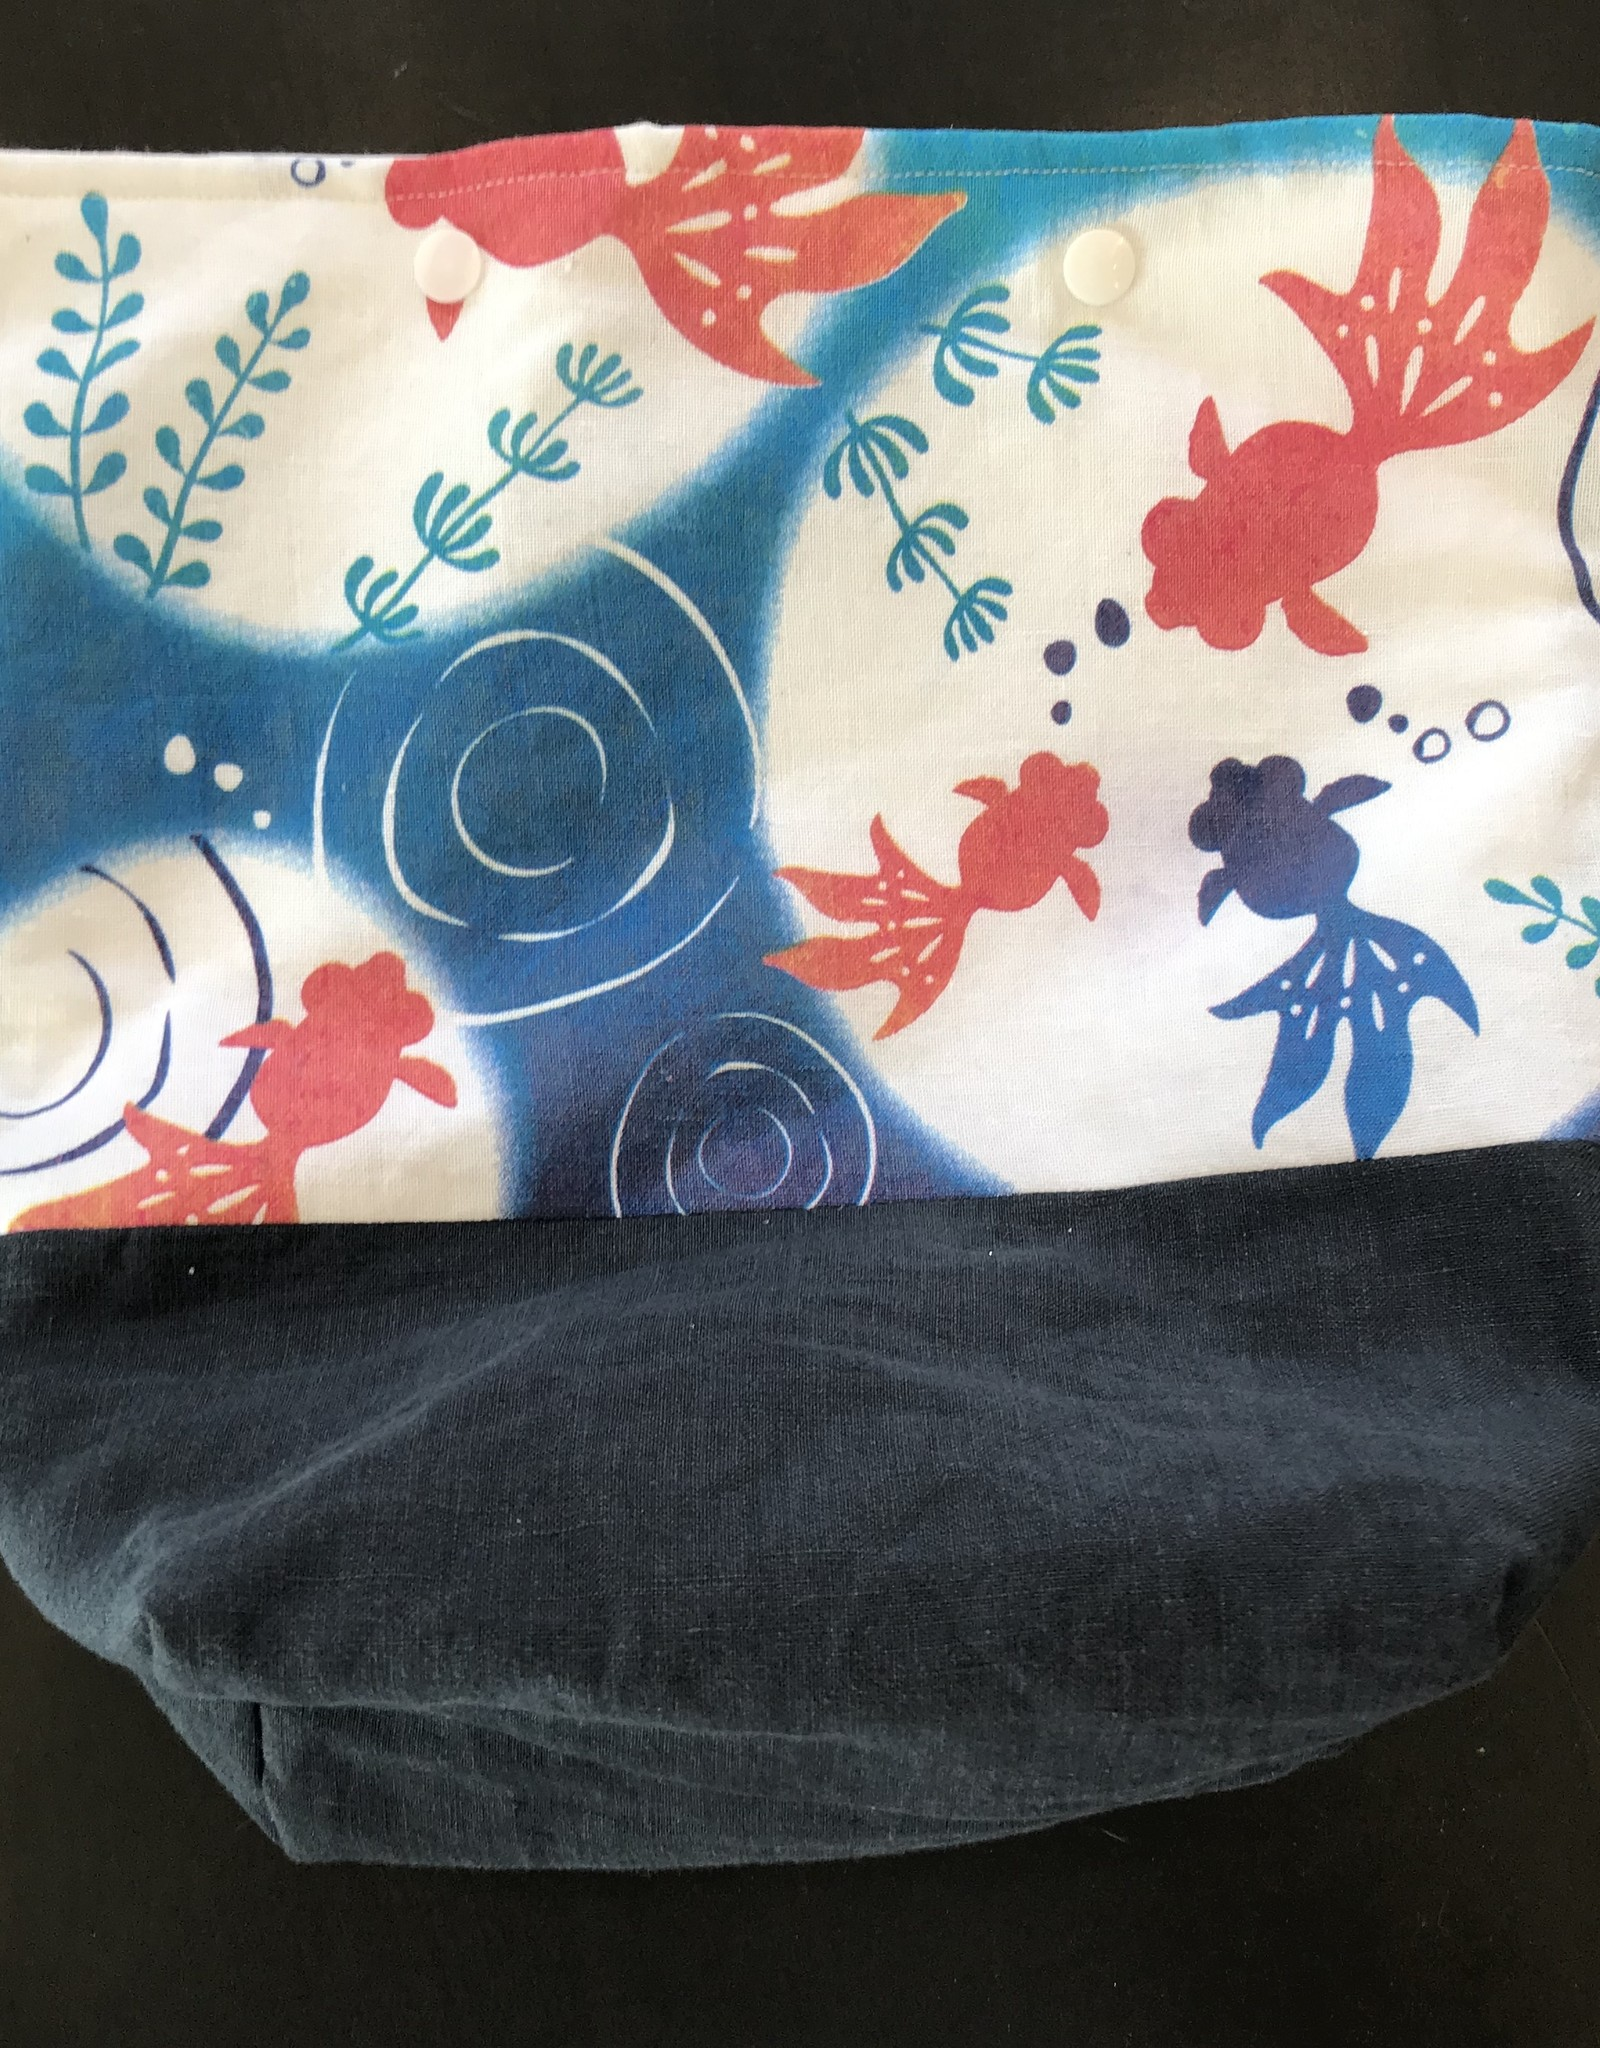 Readhead Design Co. Project Bag - Medium, Snap